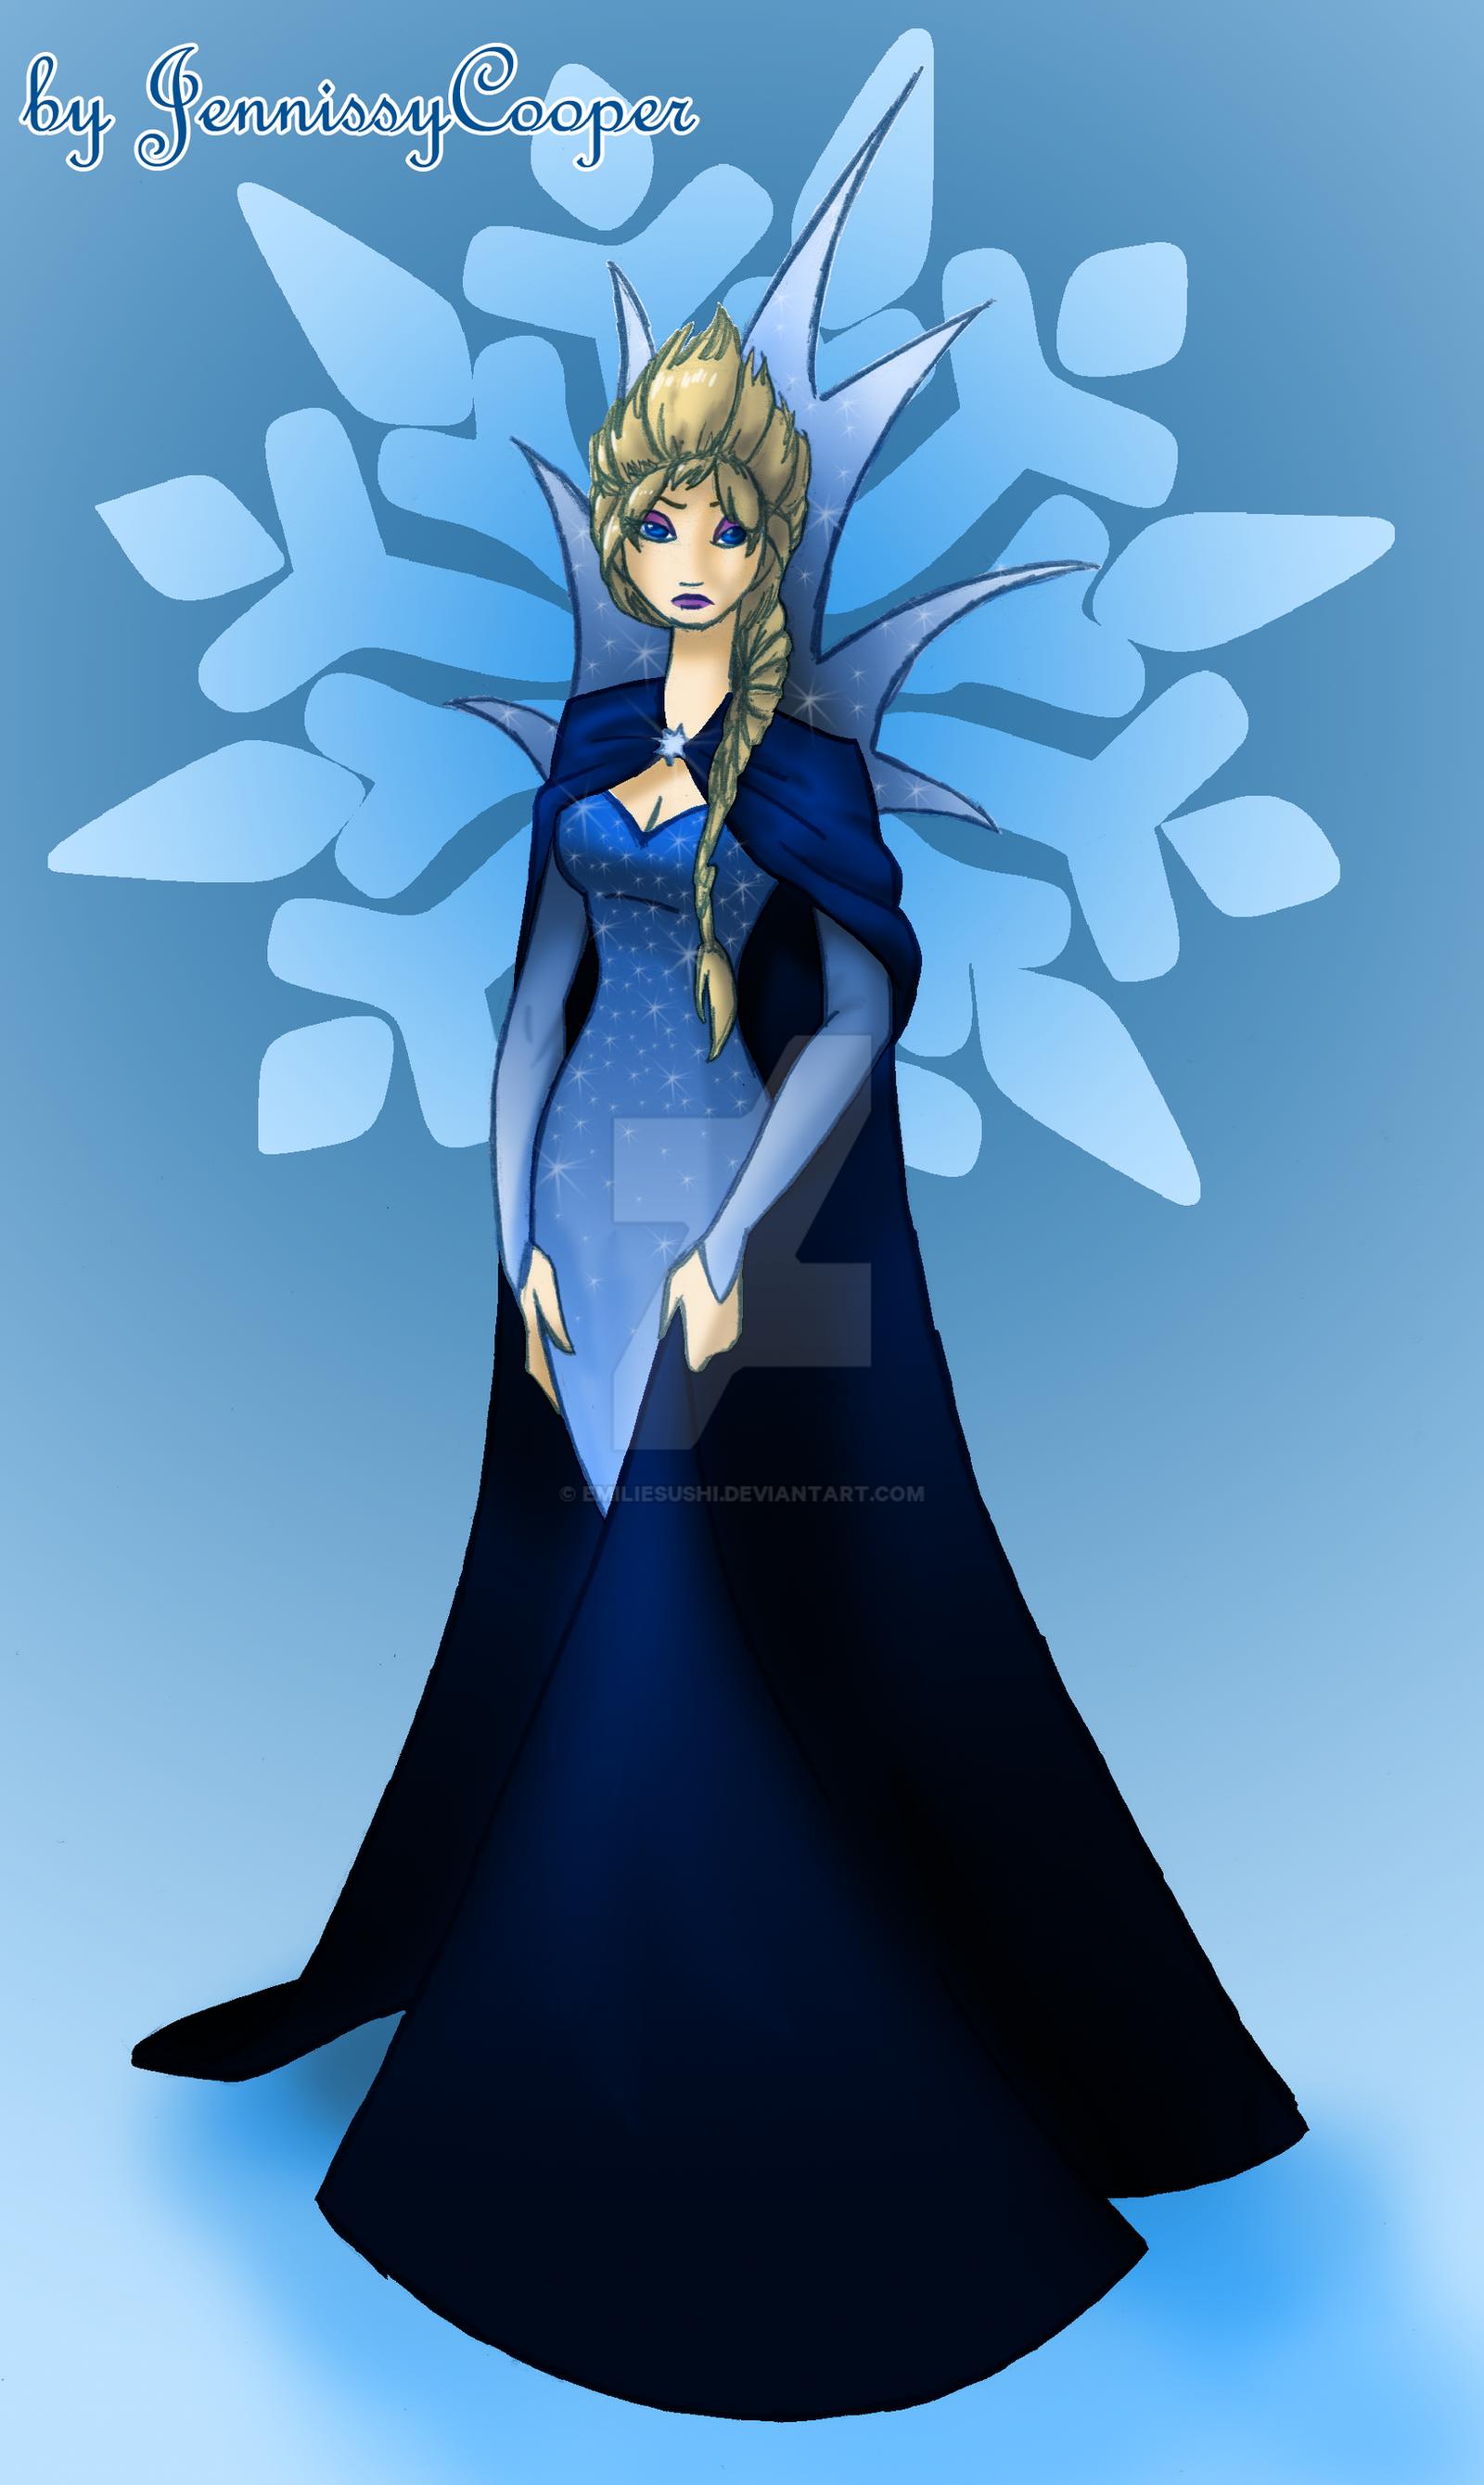 Evil Elsa Design By JennissyCooper On DeviantArt